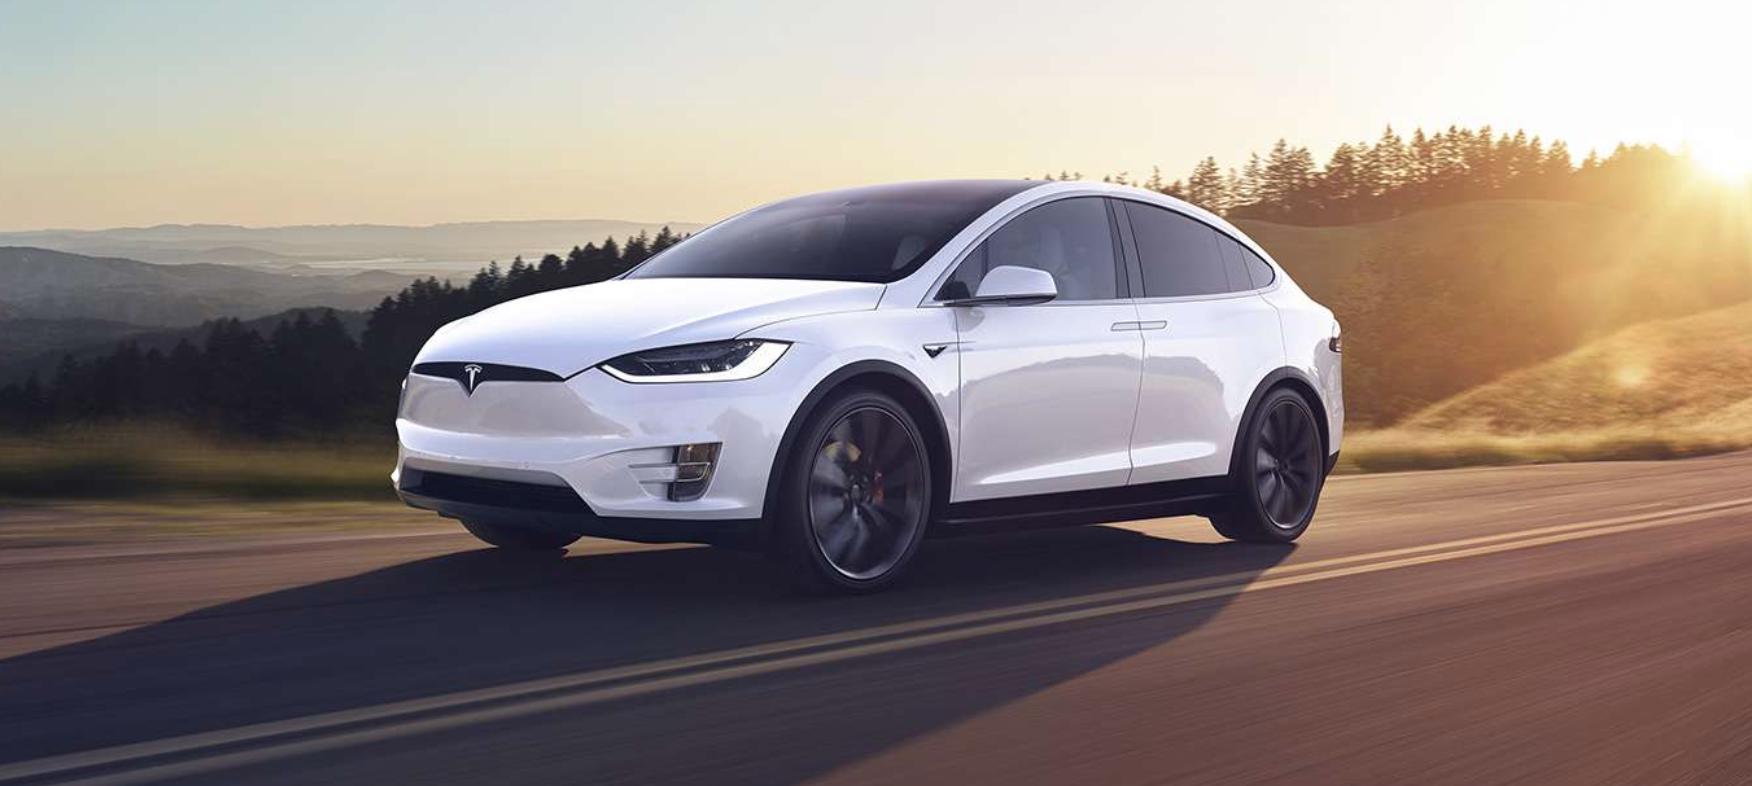 Tesla Reduces Car Crash